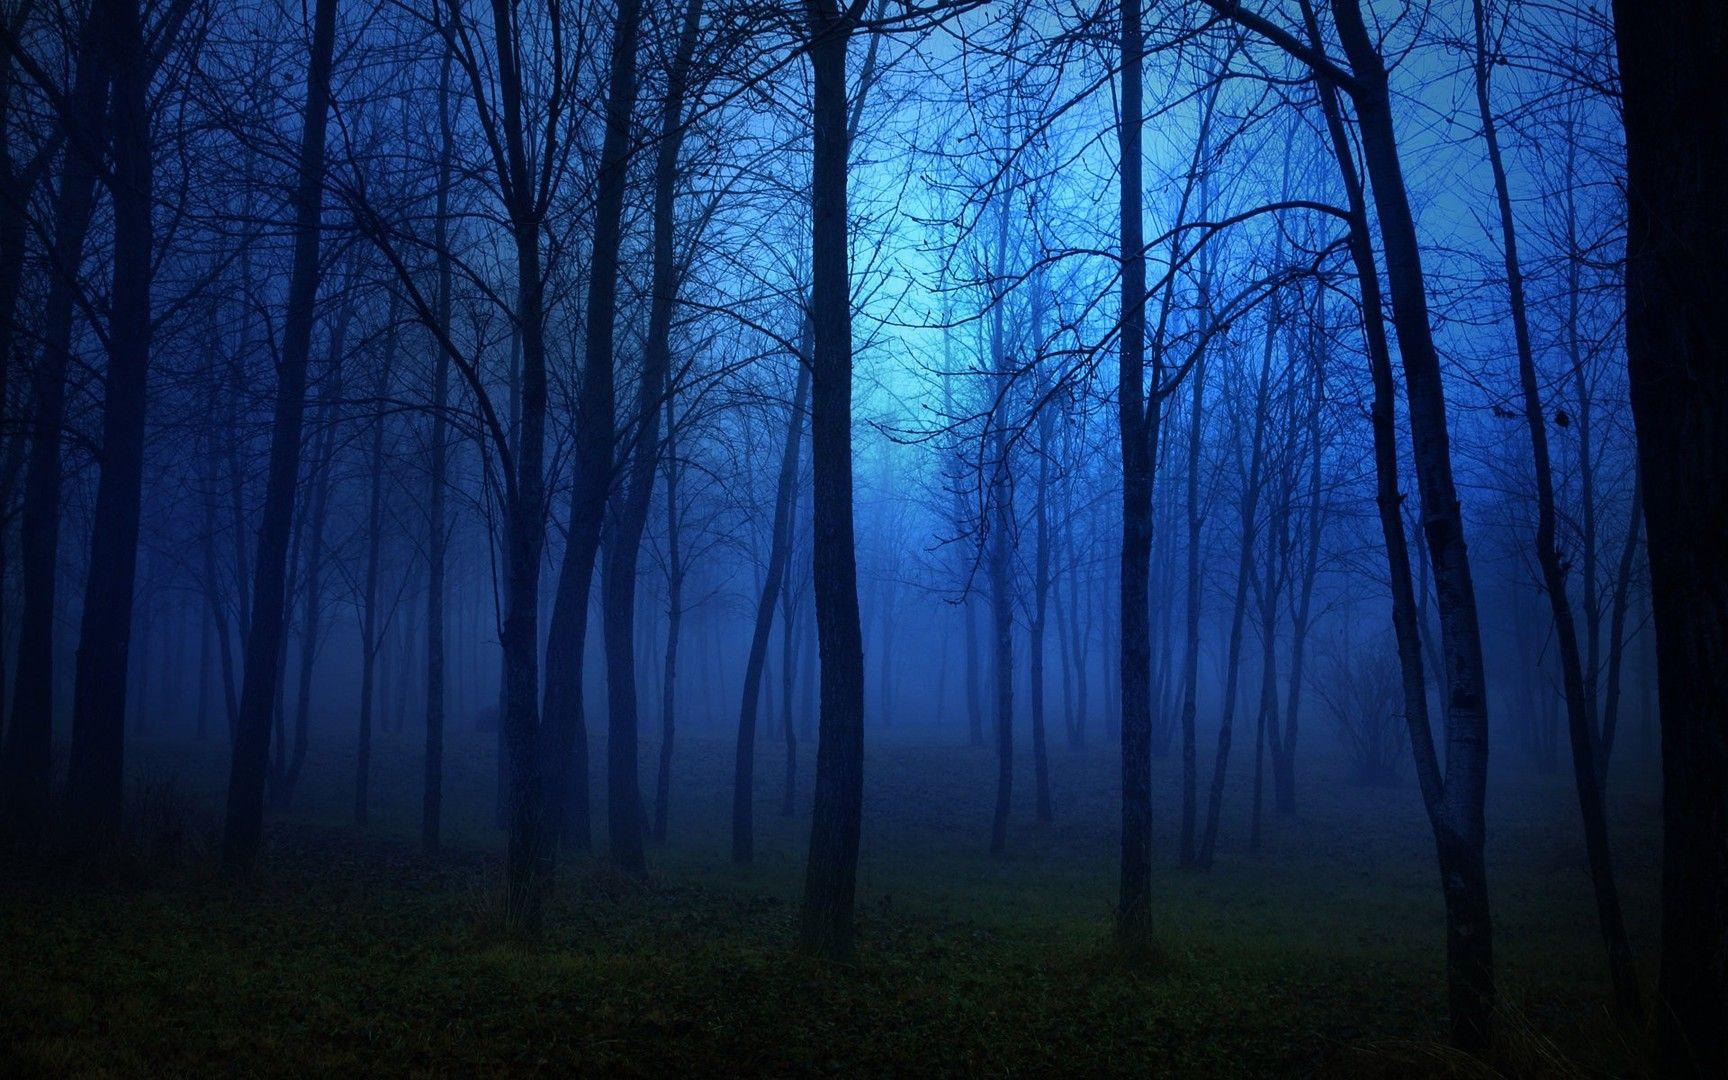 Forest Night Wallpaper...